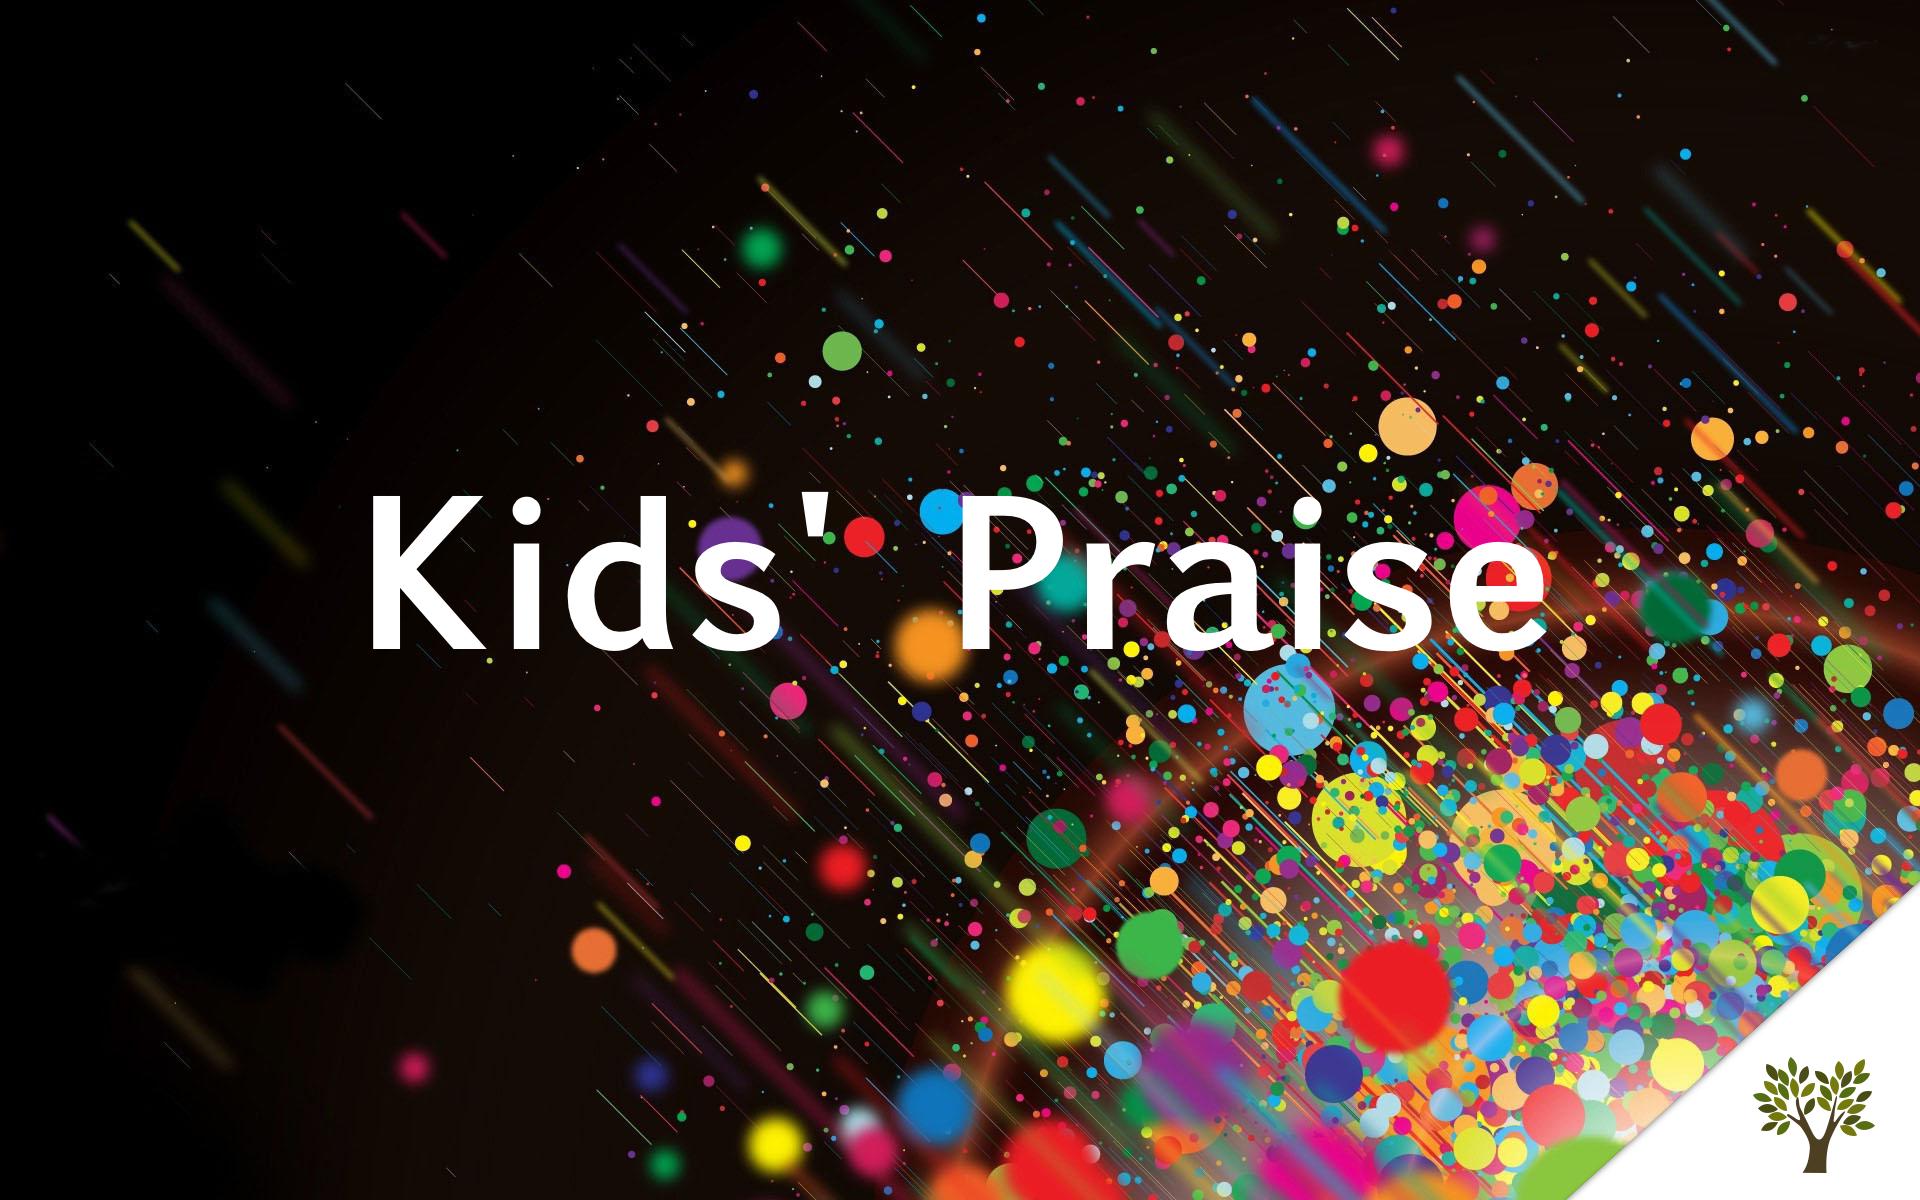 Kids' Praise